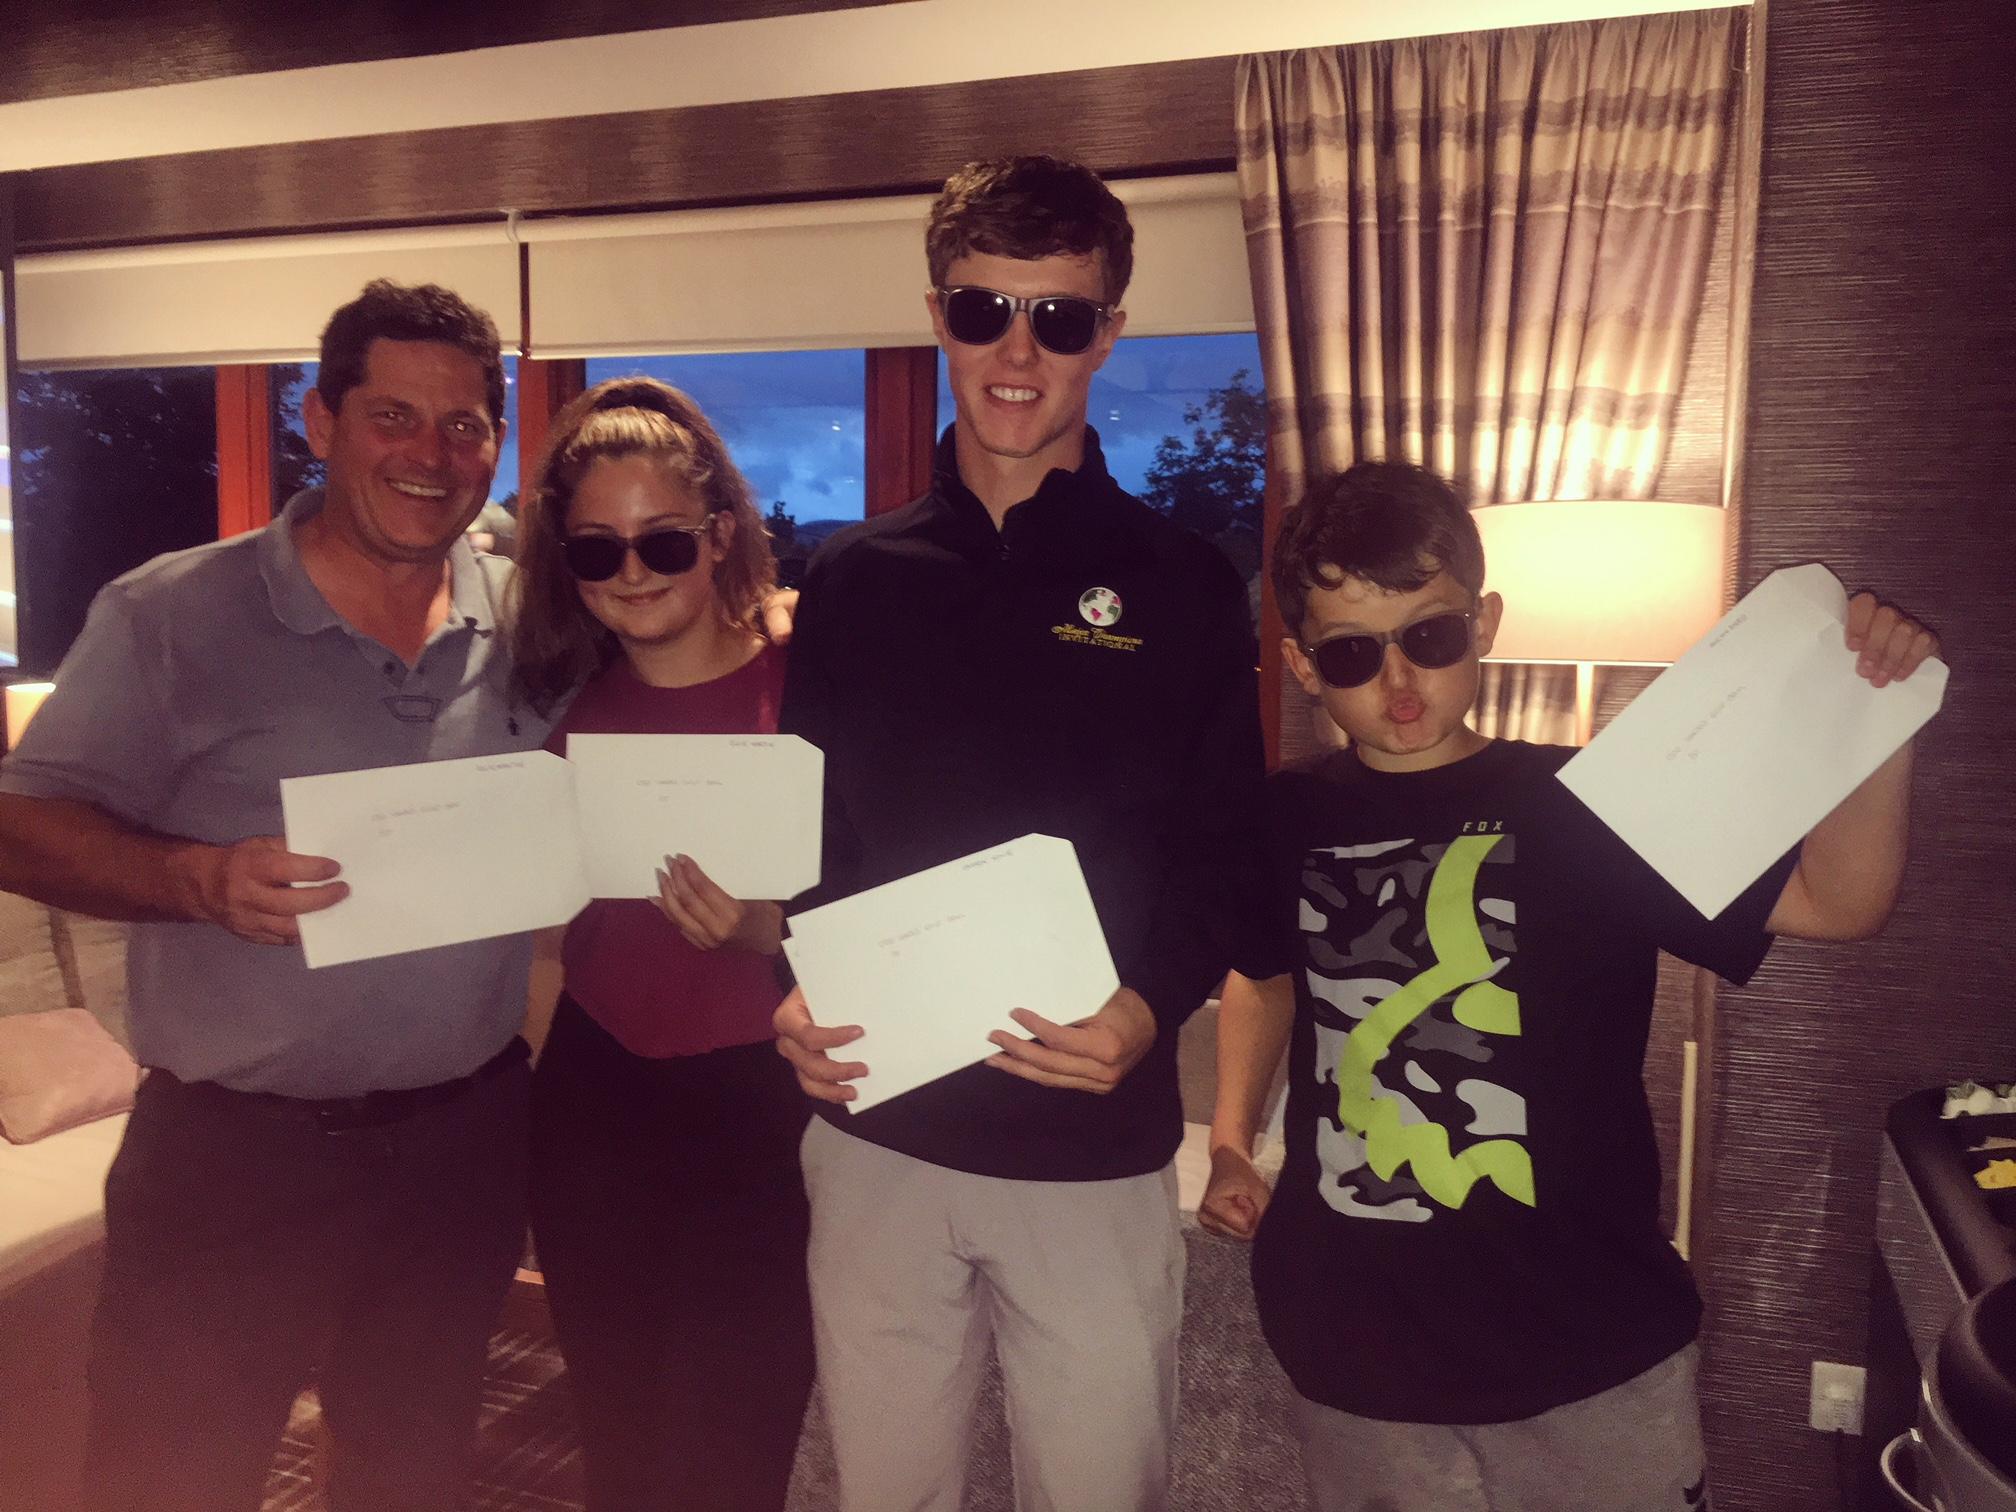 Team Winners: Rick Martin, Ellie Martin, Darren Howie and Ben Martin (standing in for ricky sked)